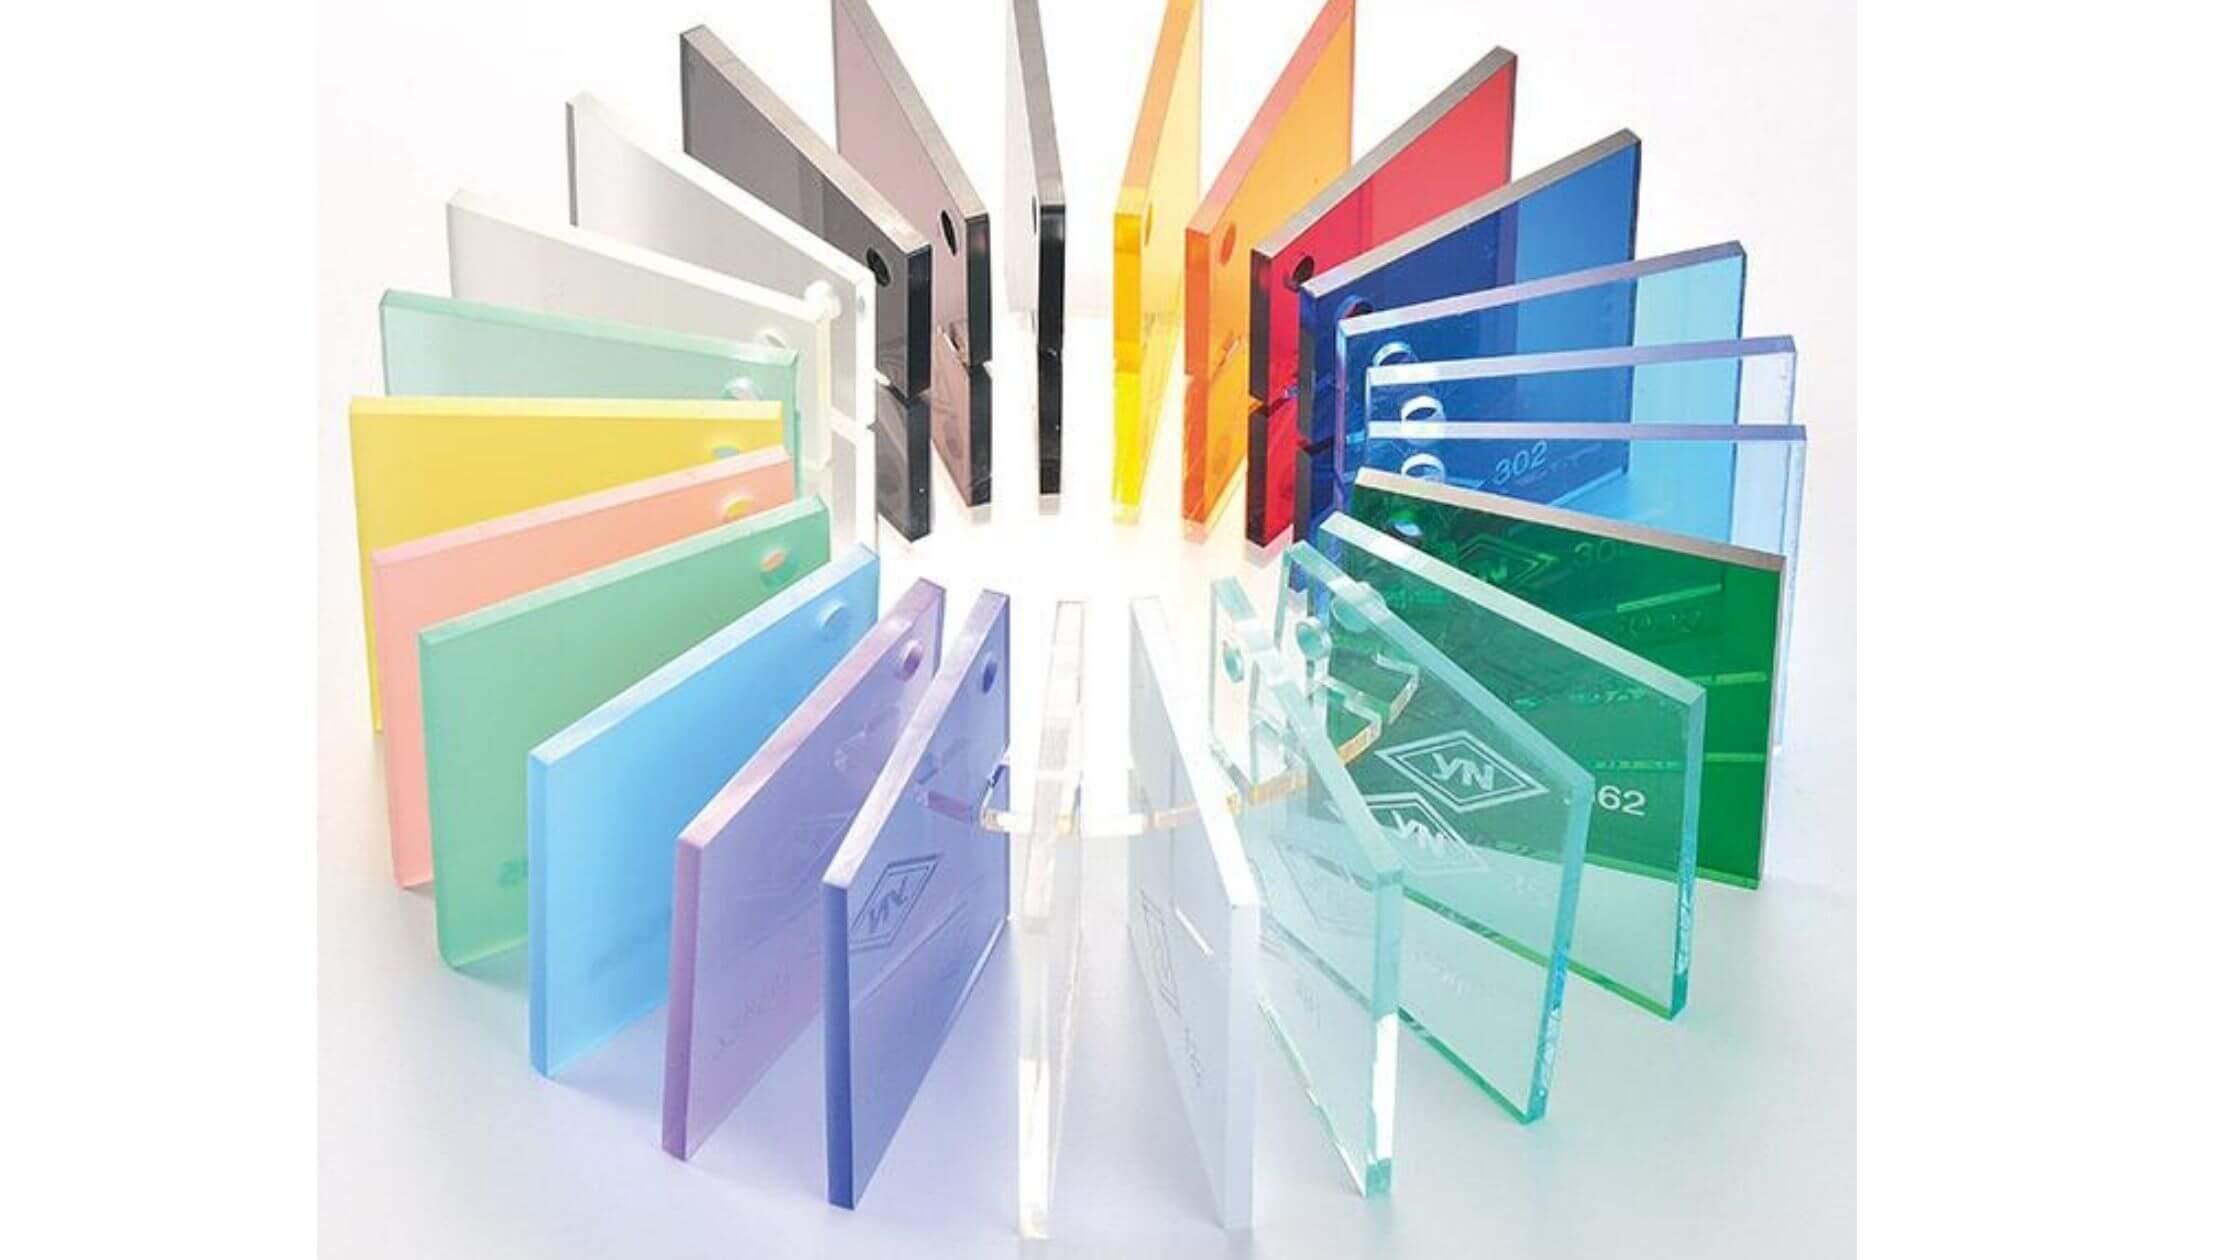 acrylic sheet, acrylic mirror, lgp, abs sheet, plastic sheet